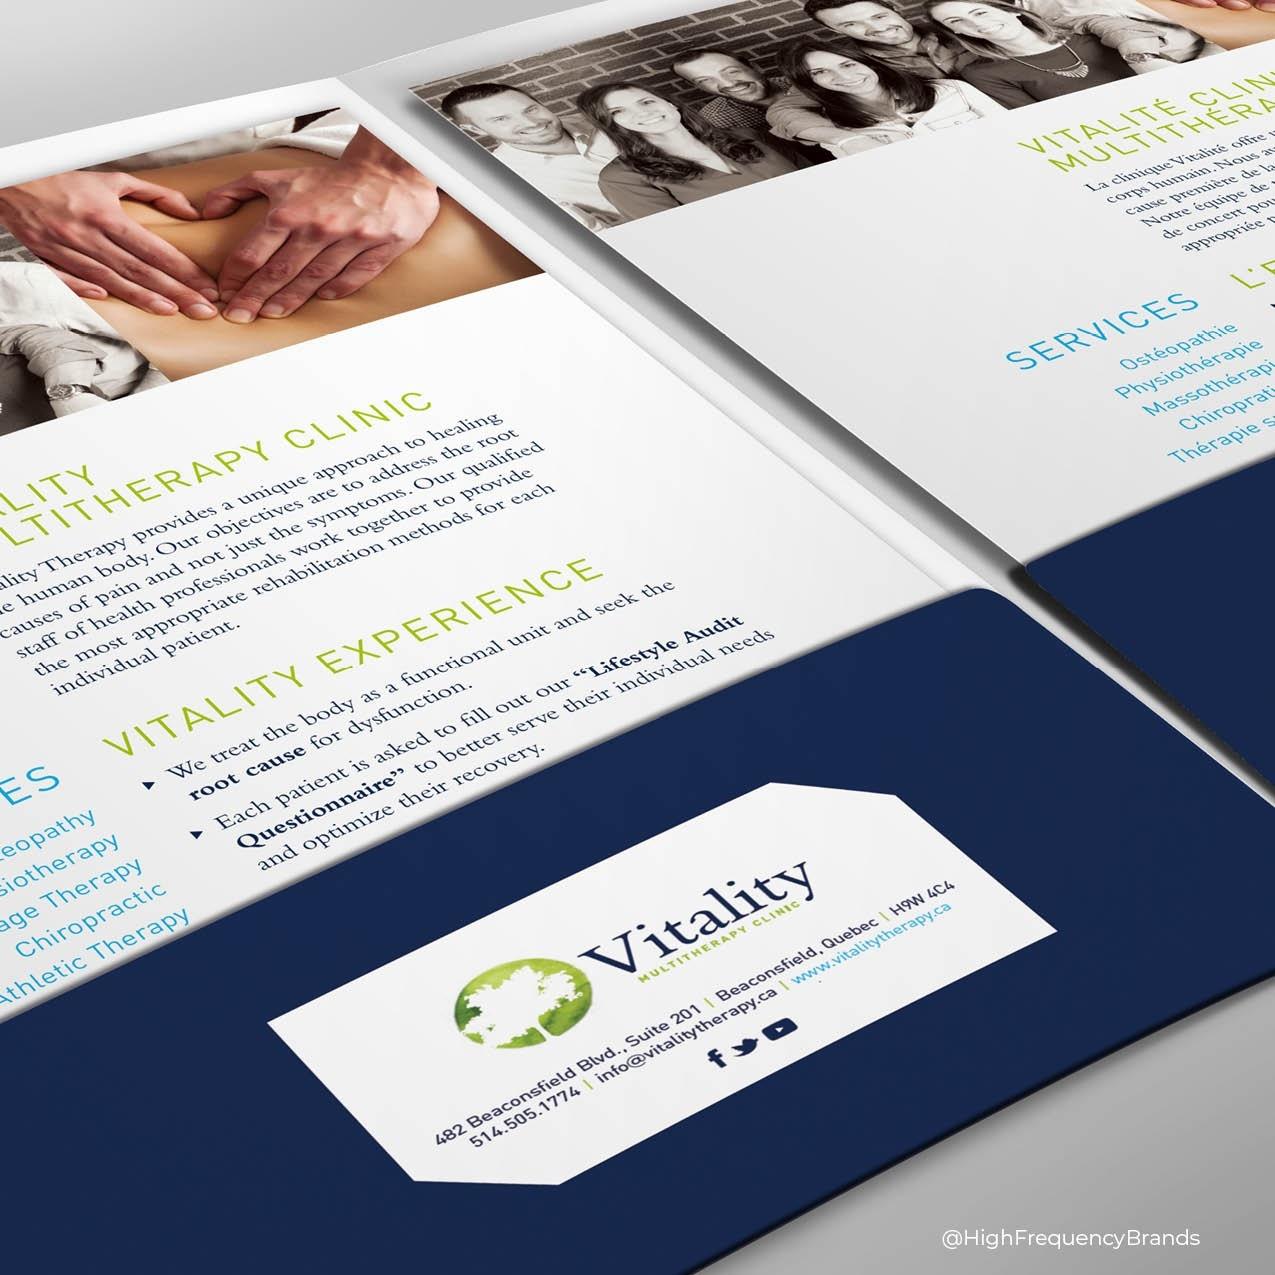 Pocket Folder & Insert Design Branded by High Frequency Brands